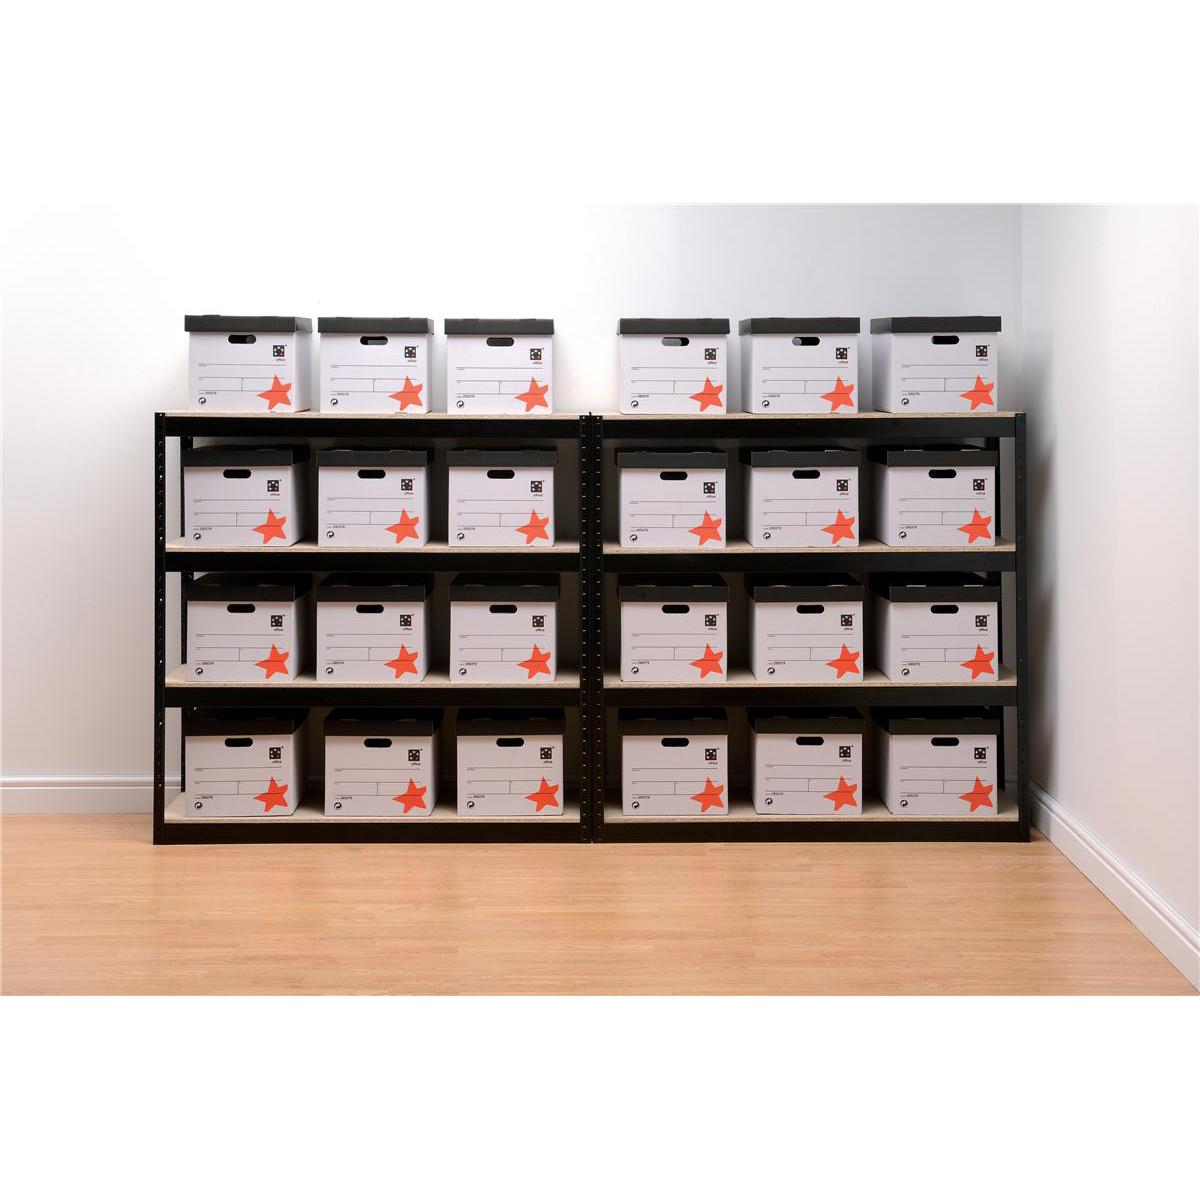 Trexus Archive Shelving Unit Heavy-duty Boltless 4 Shelves Capacity 4x 100kg W1320xD450xH1315mm Black